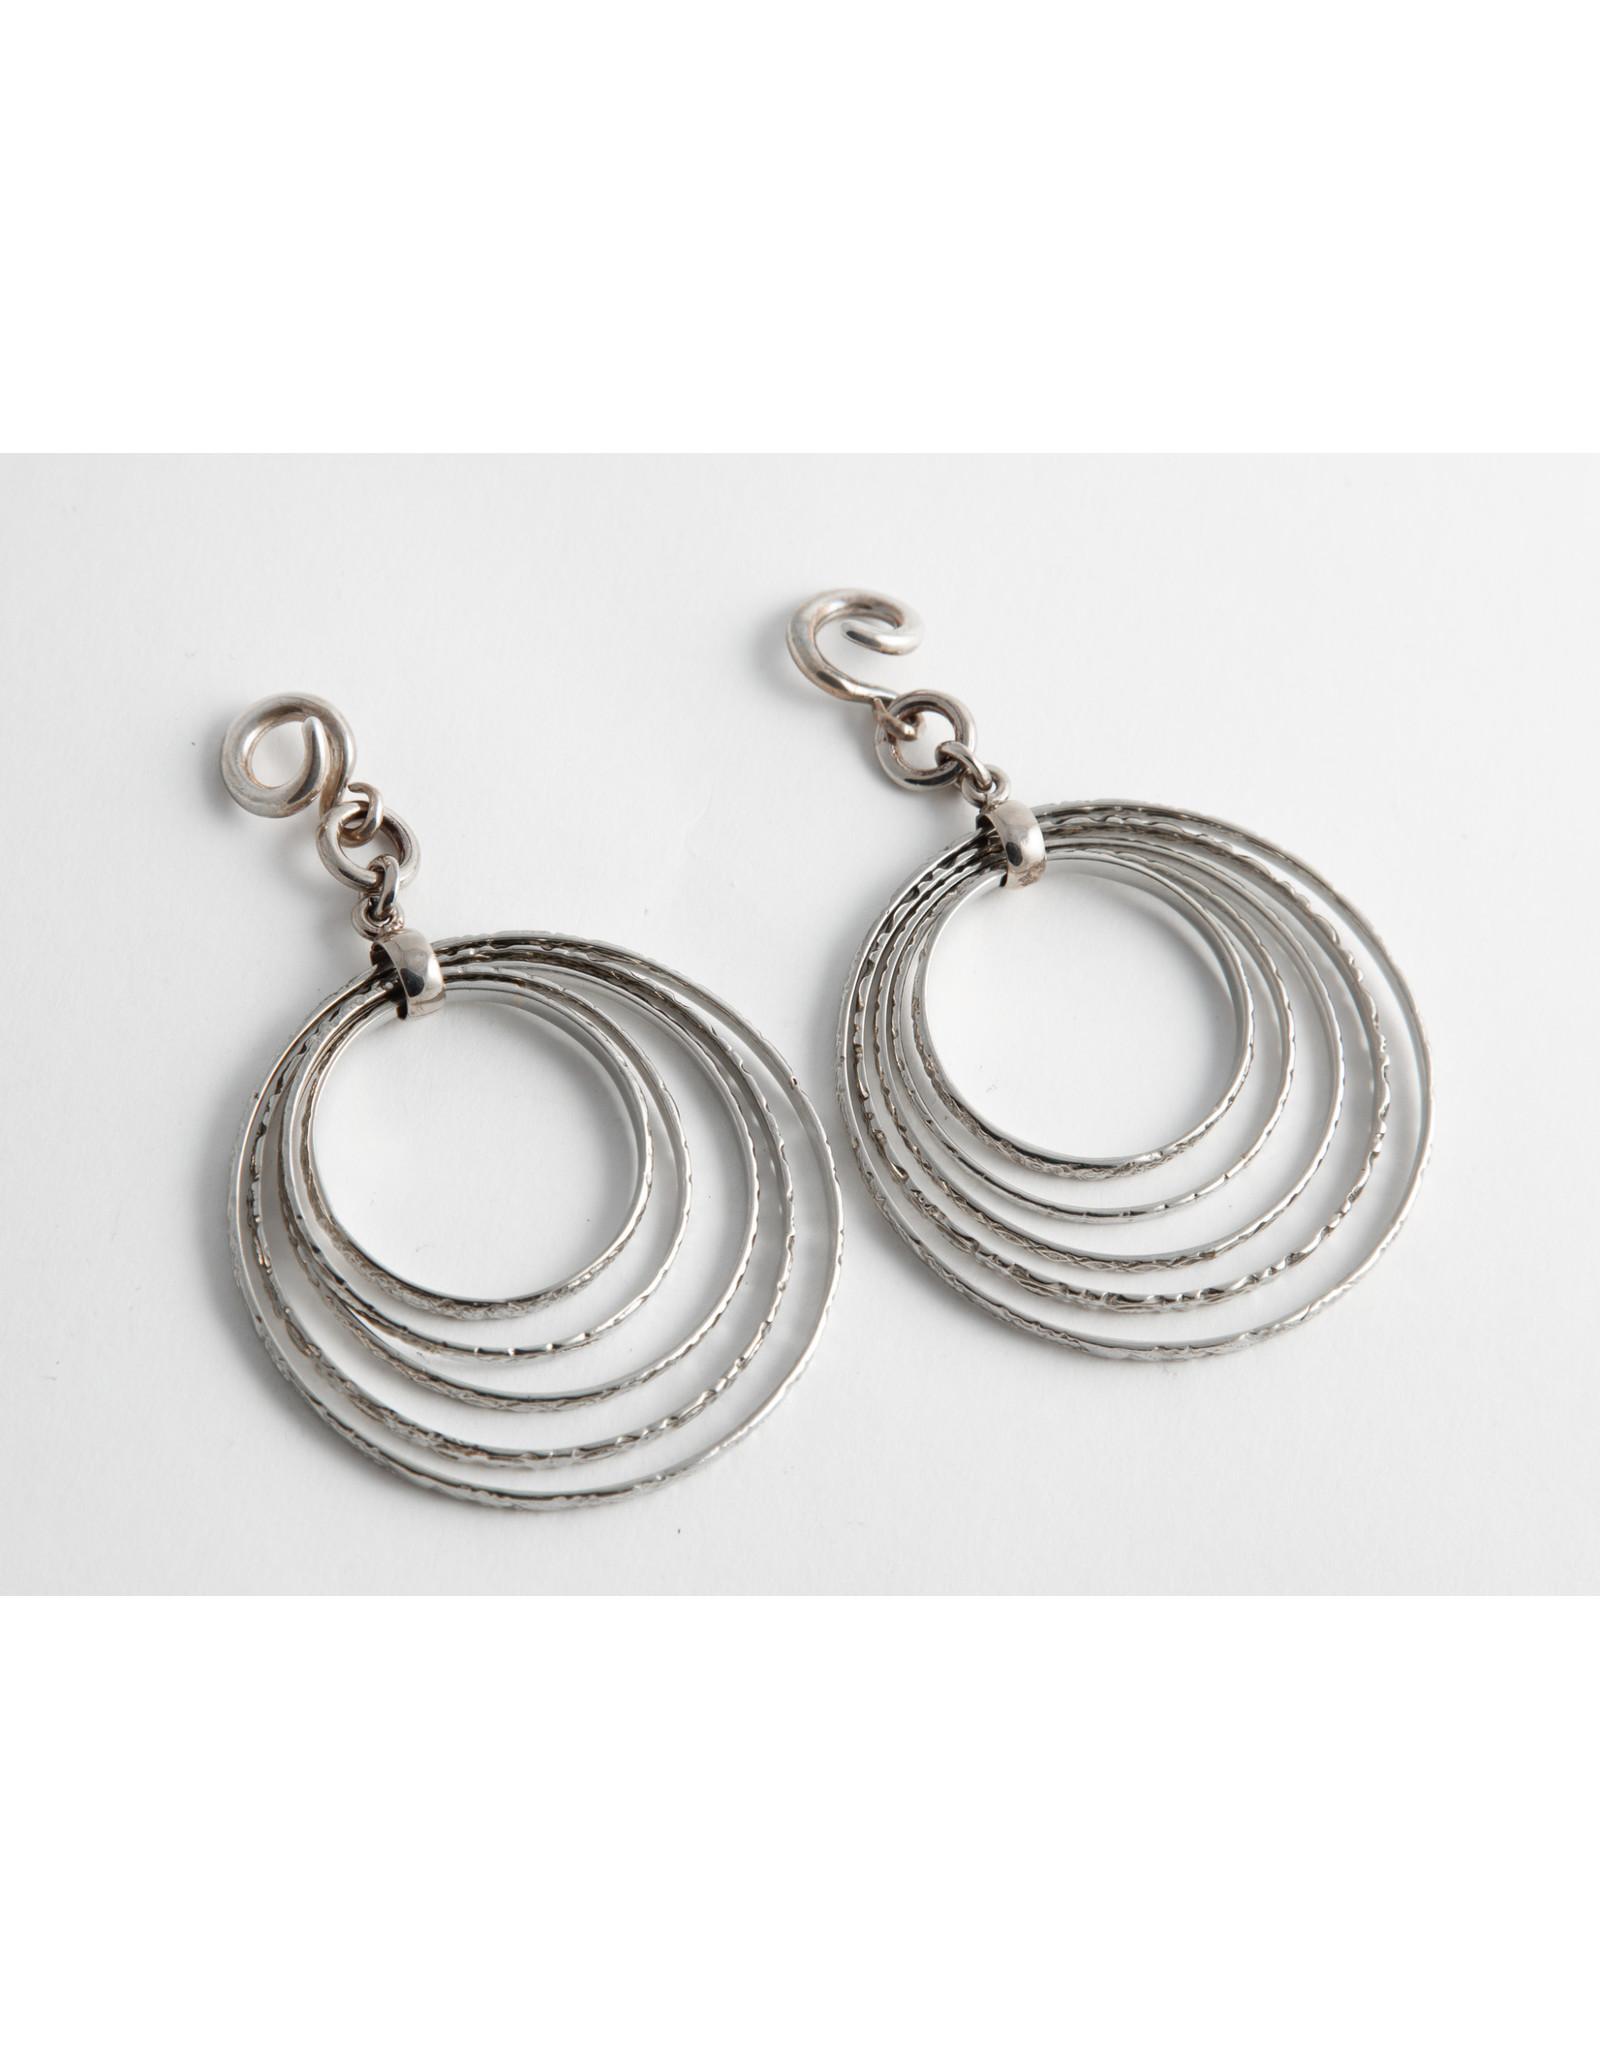 Diablo Organics Diablo Organics white brass 5 ring hoop on small silver classic coil